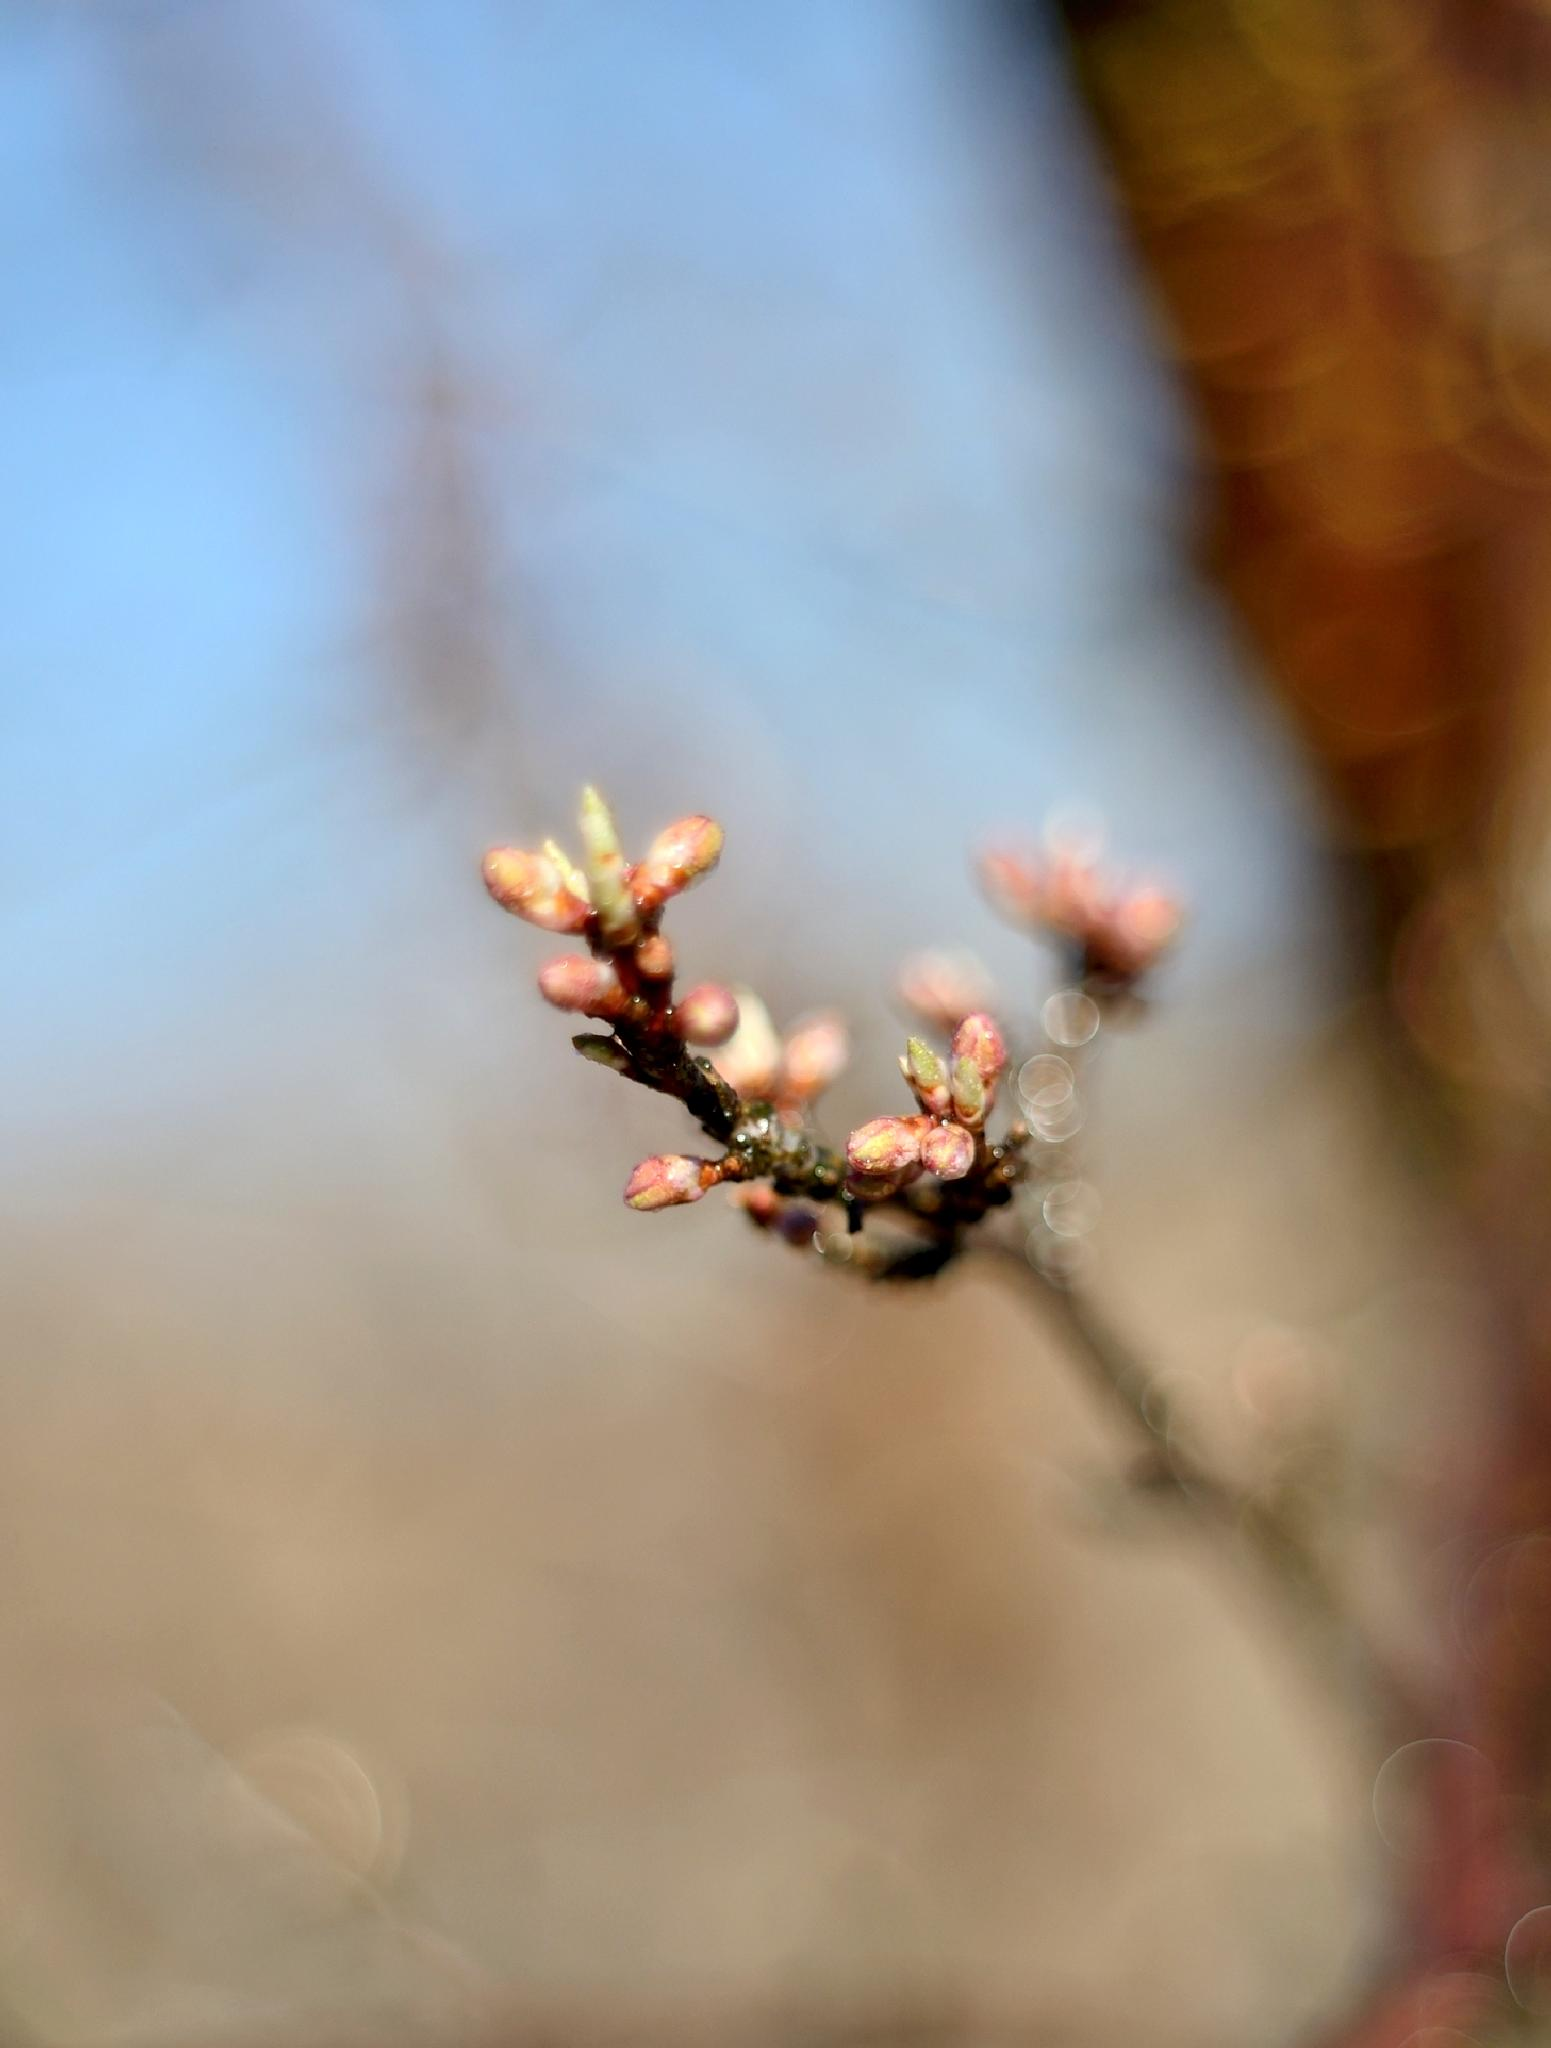 Flower buds on a twig by habibi27